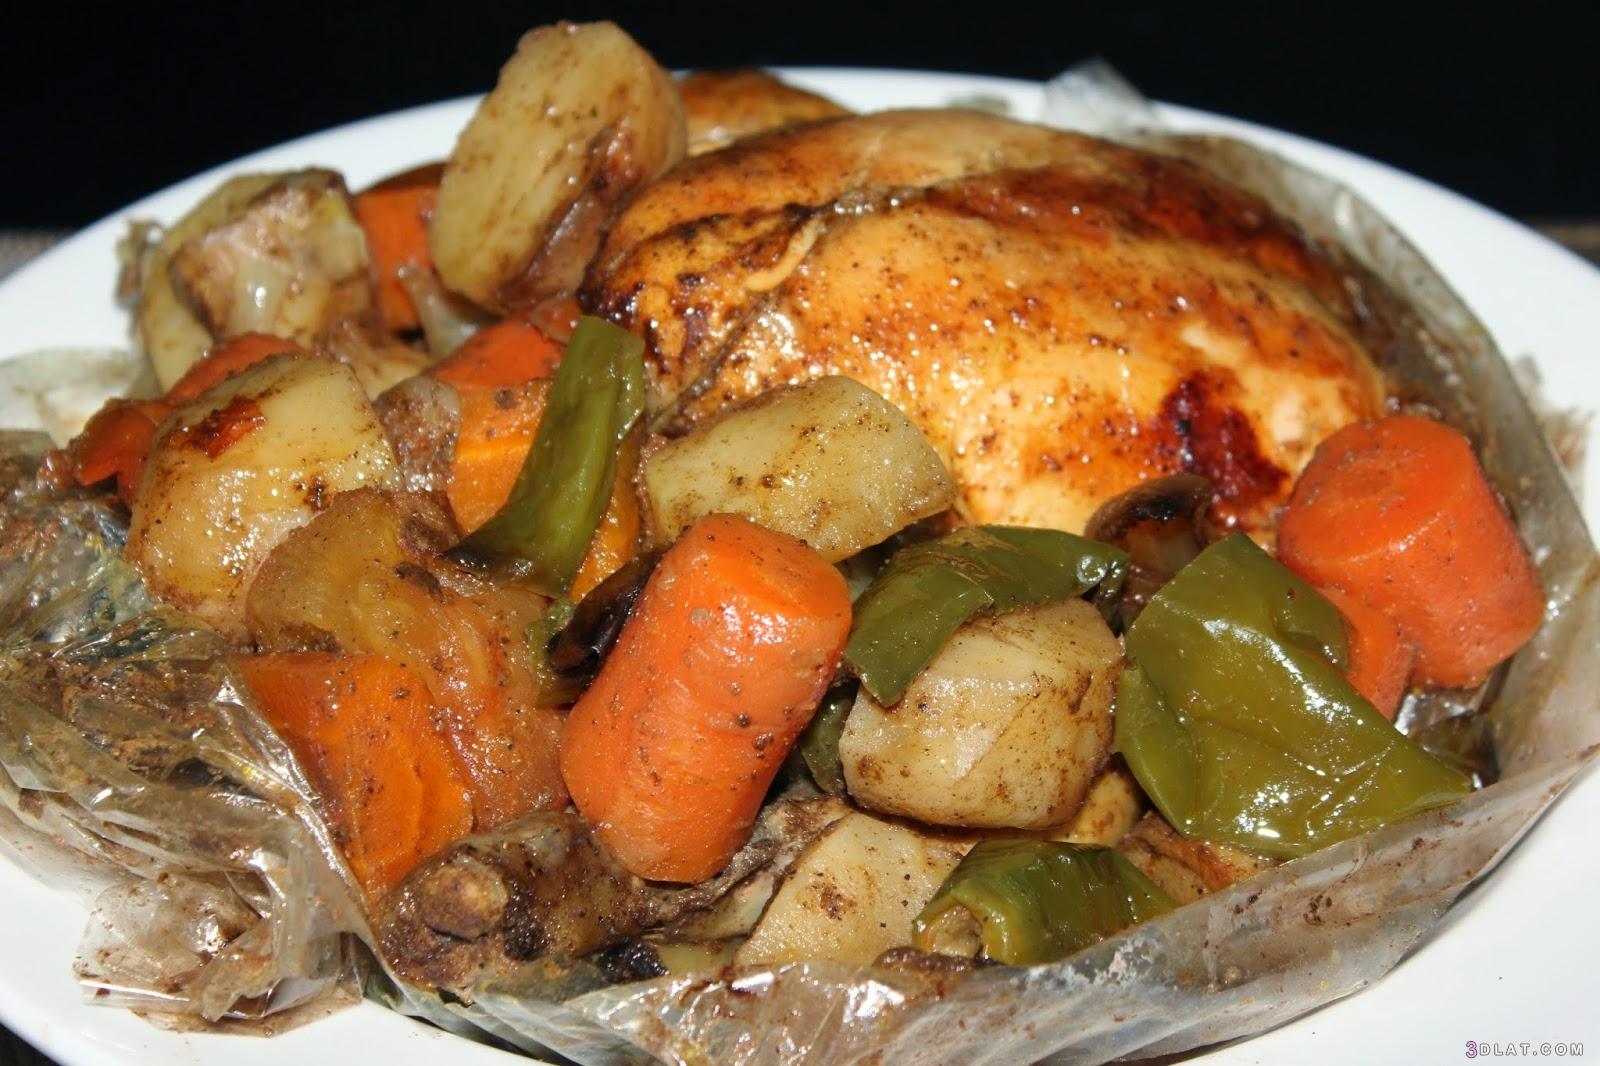 الدجاج, بالخضراوات،, بالخضروات, دجاج